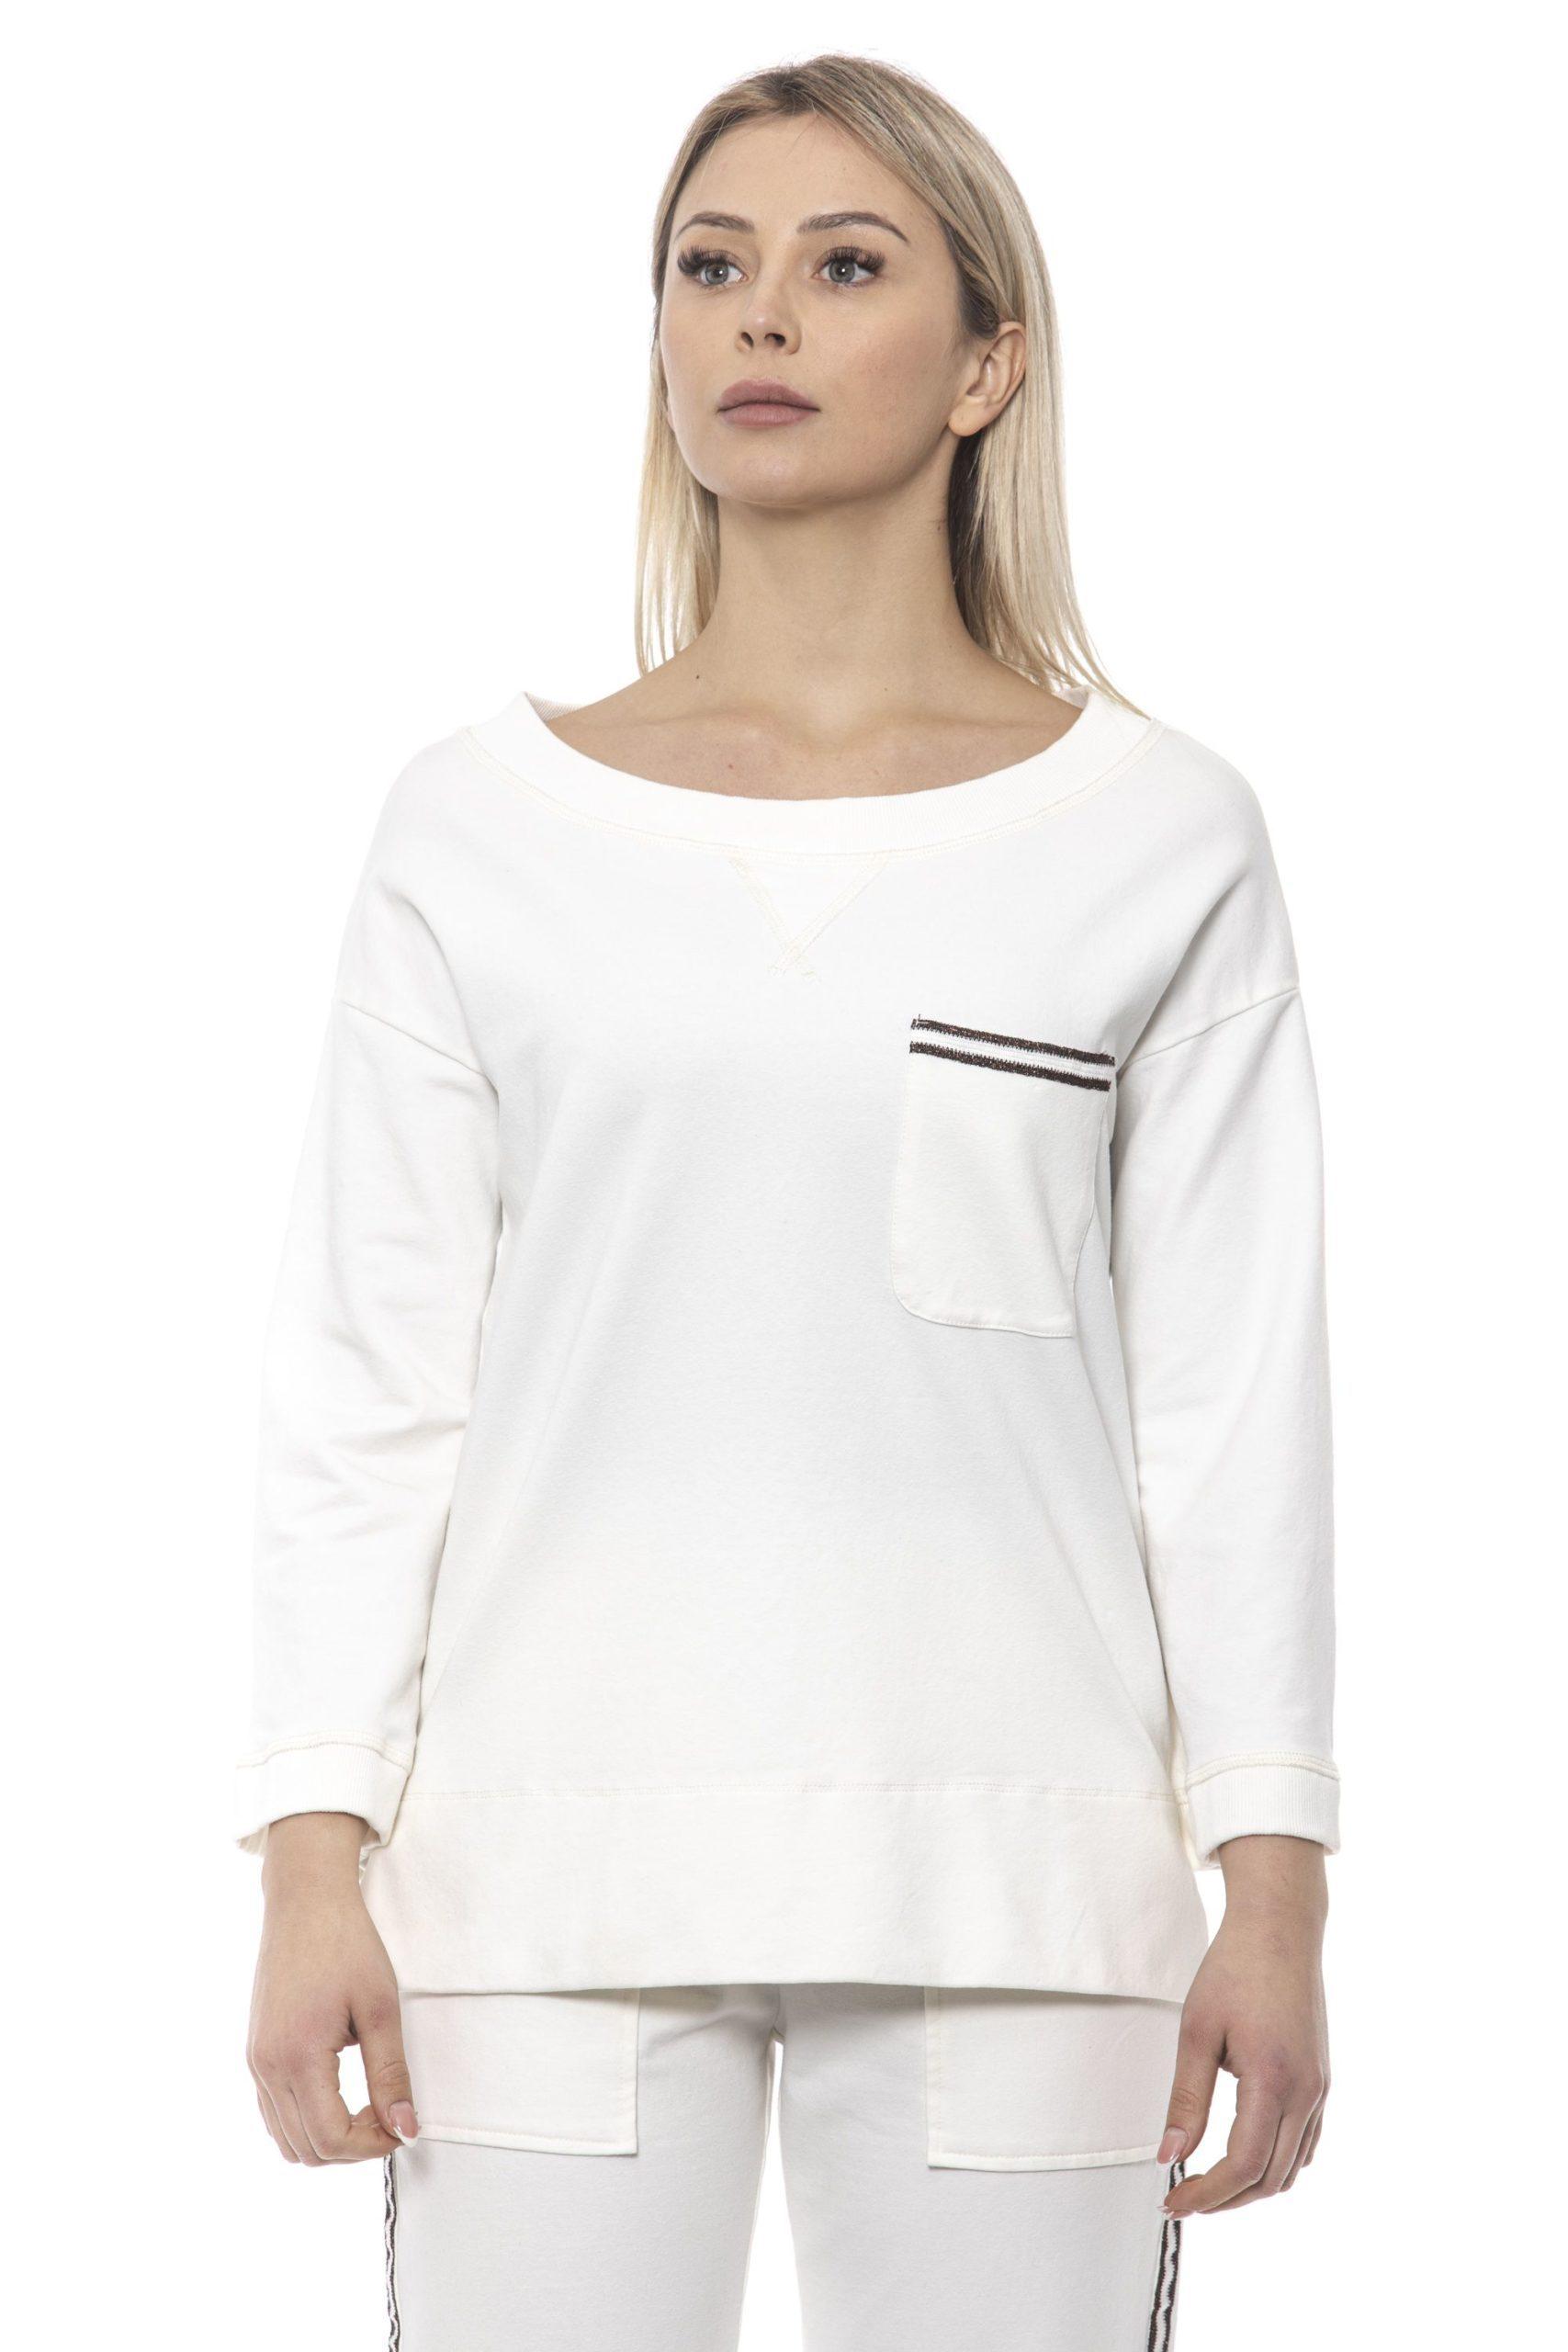 Alpha Studio Women's E C R U' Sweater White AL1375197 - IT40 | XS